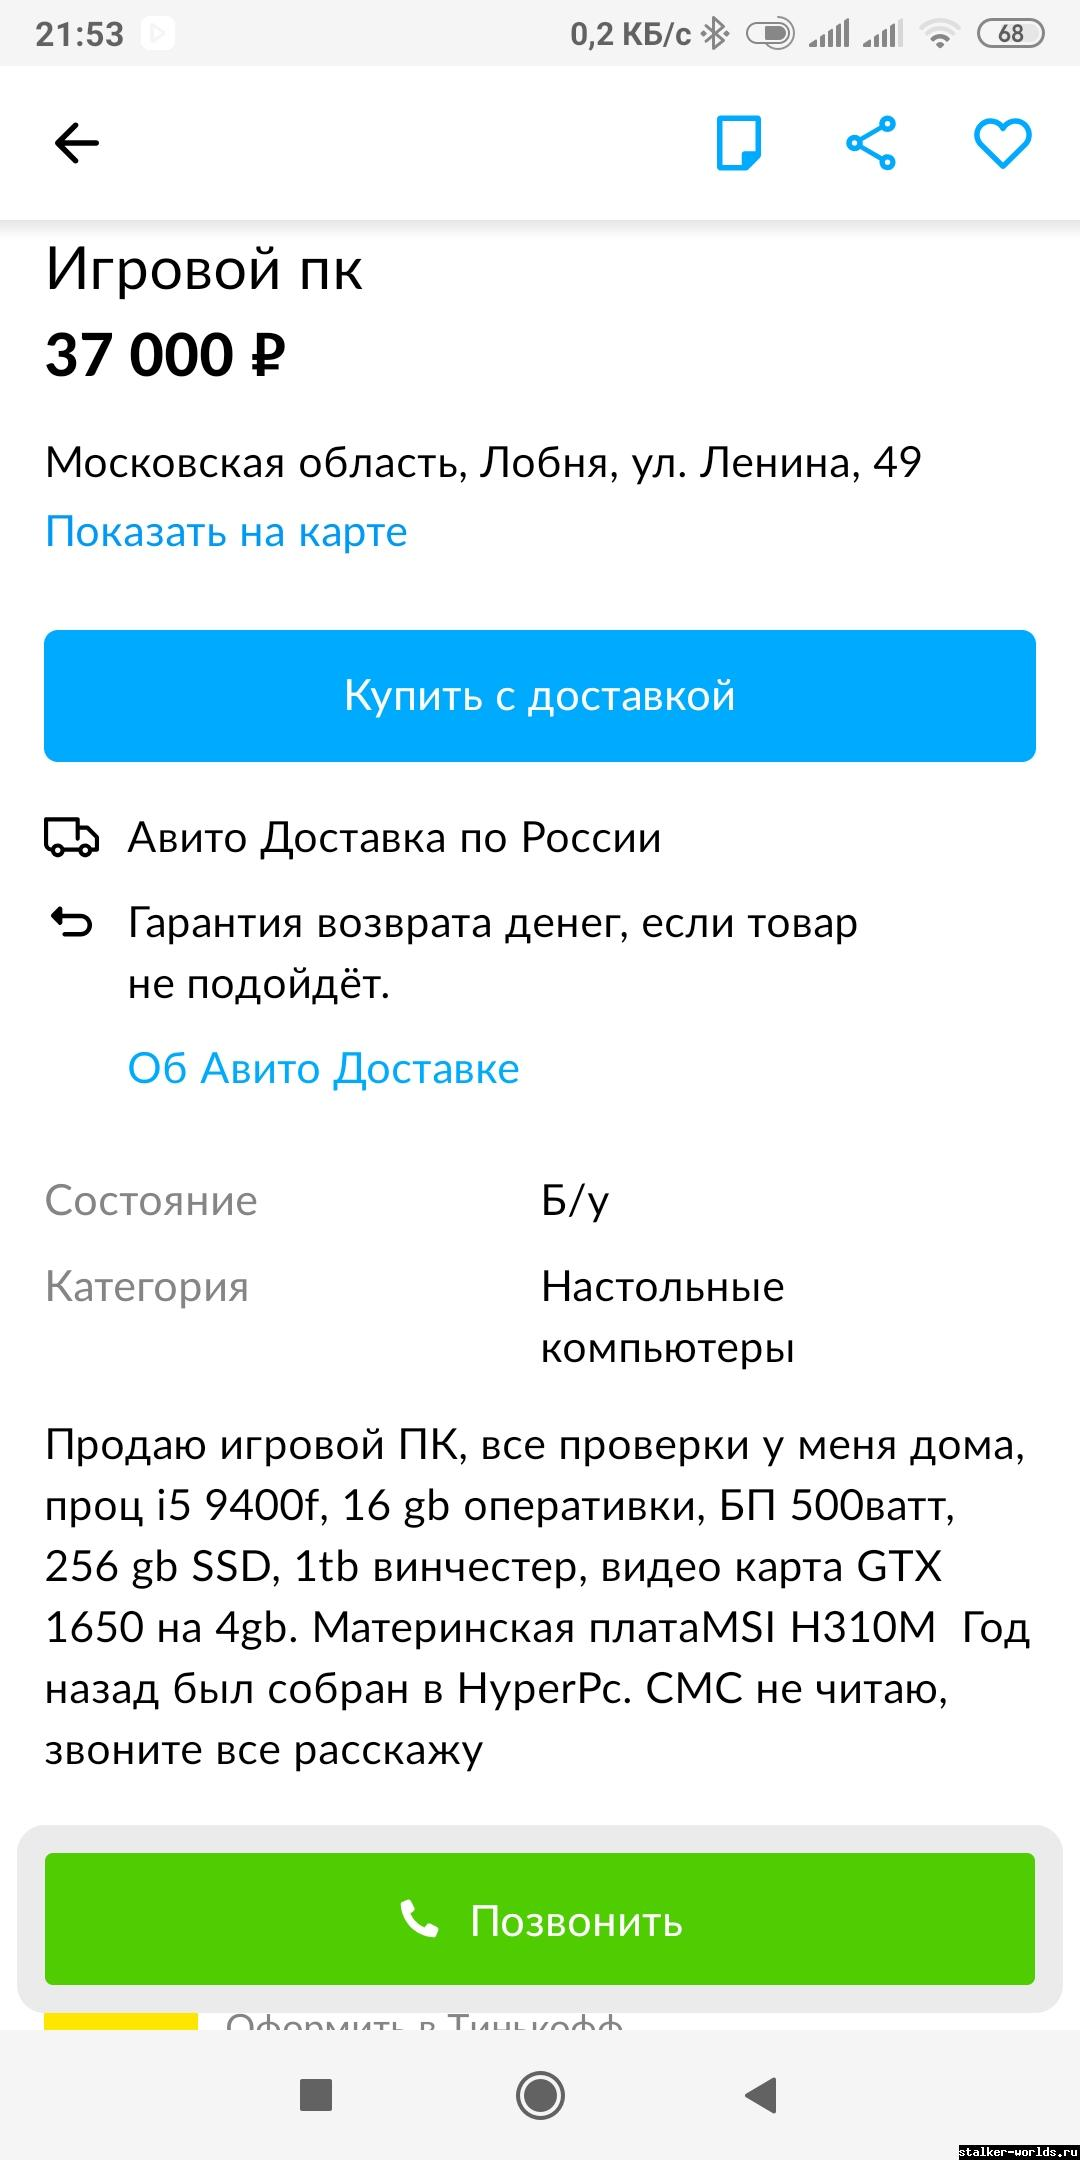 sw_1632262936__screenshot_2021-09-21-21-